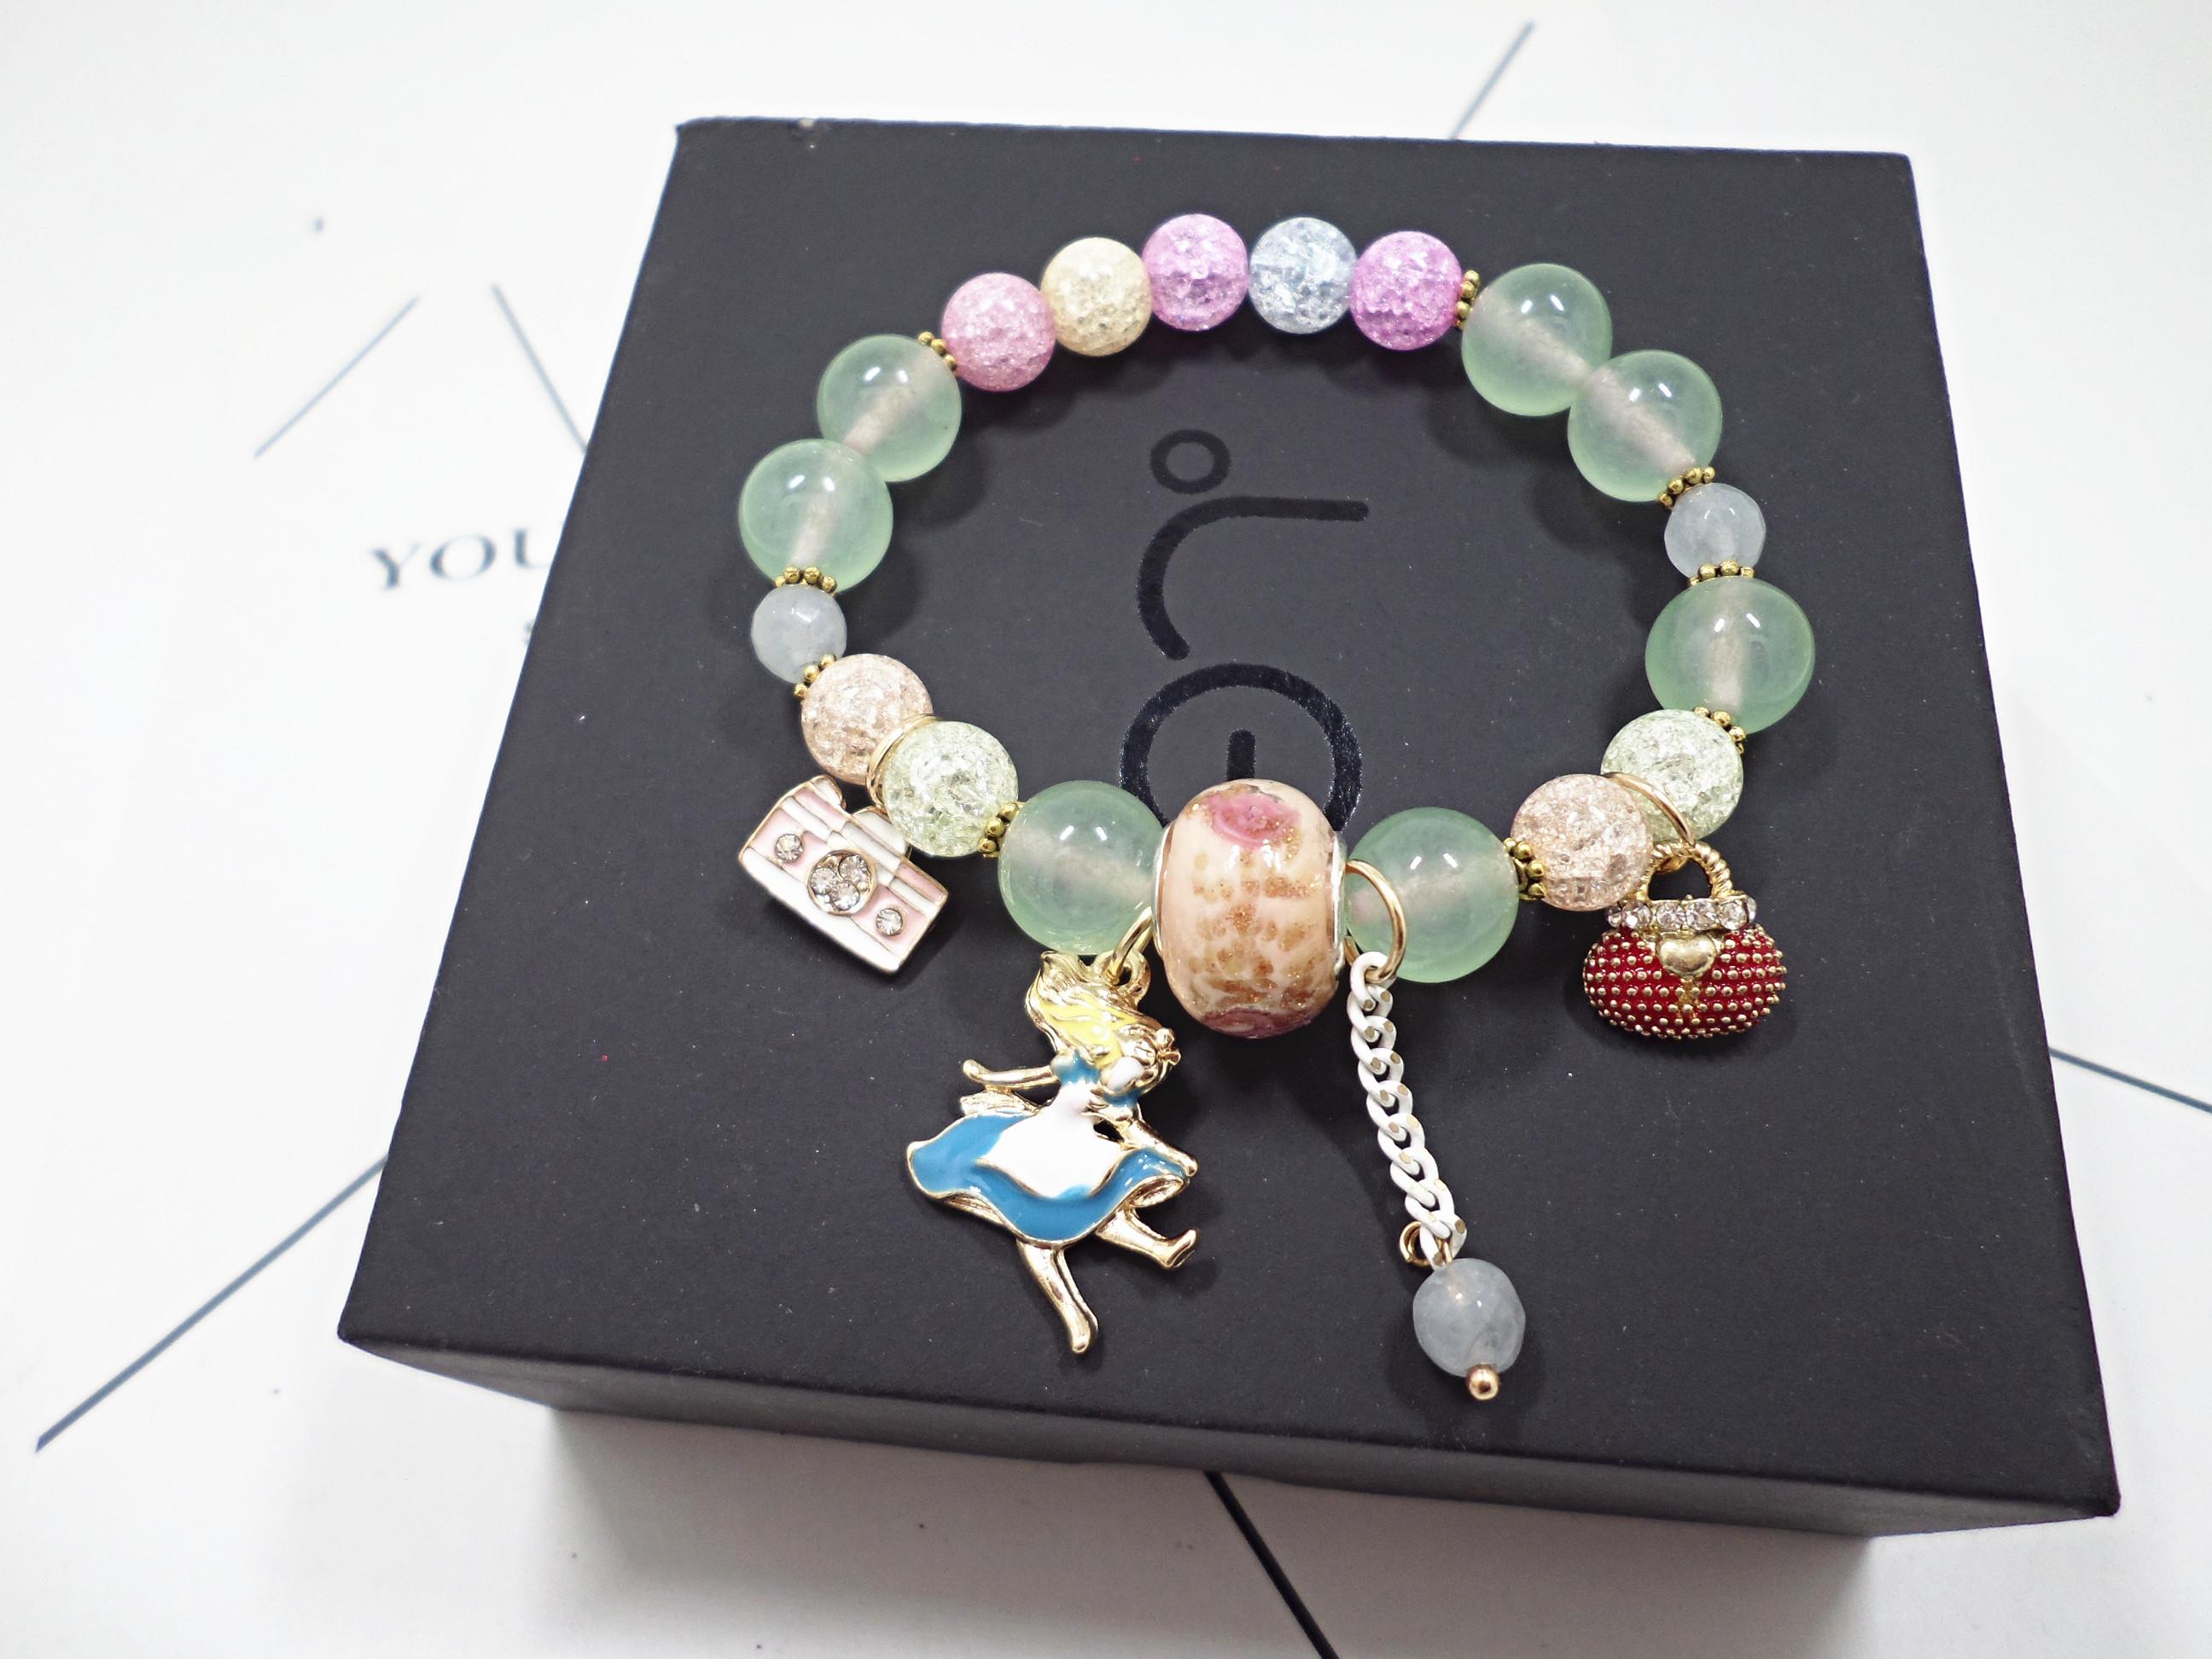 Wholesale Bohemia Girl camera crystal Bead Bracelets for Women creative jewelry wholesale Natural Stone Charms Wristband Gift  VGB097 1